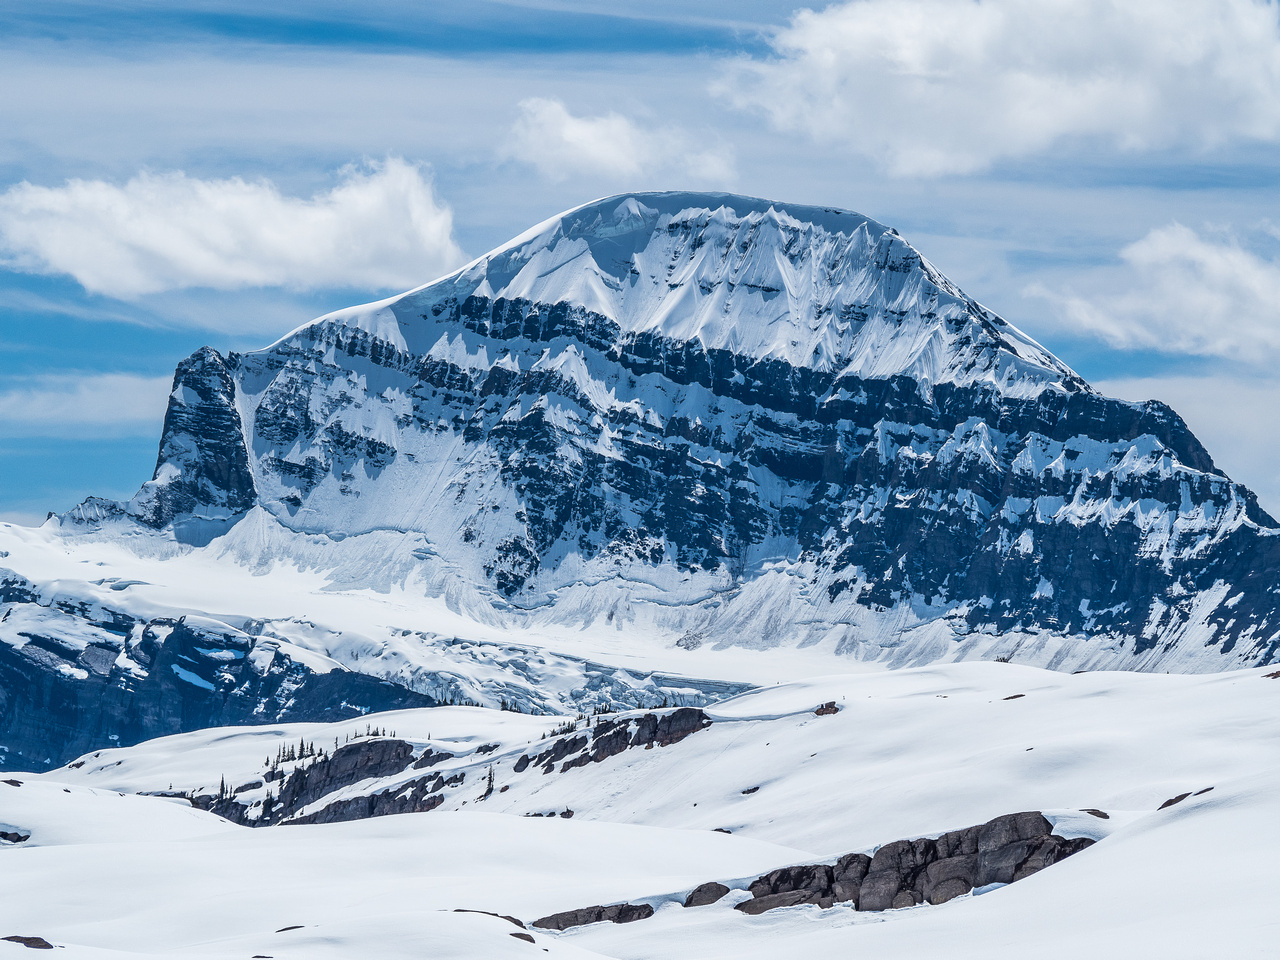 Pawn Peak